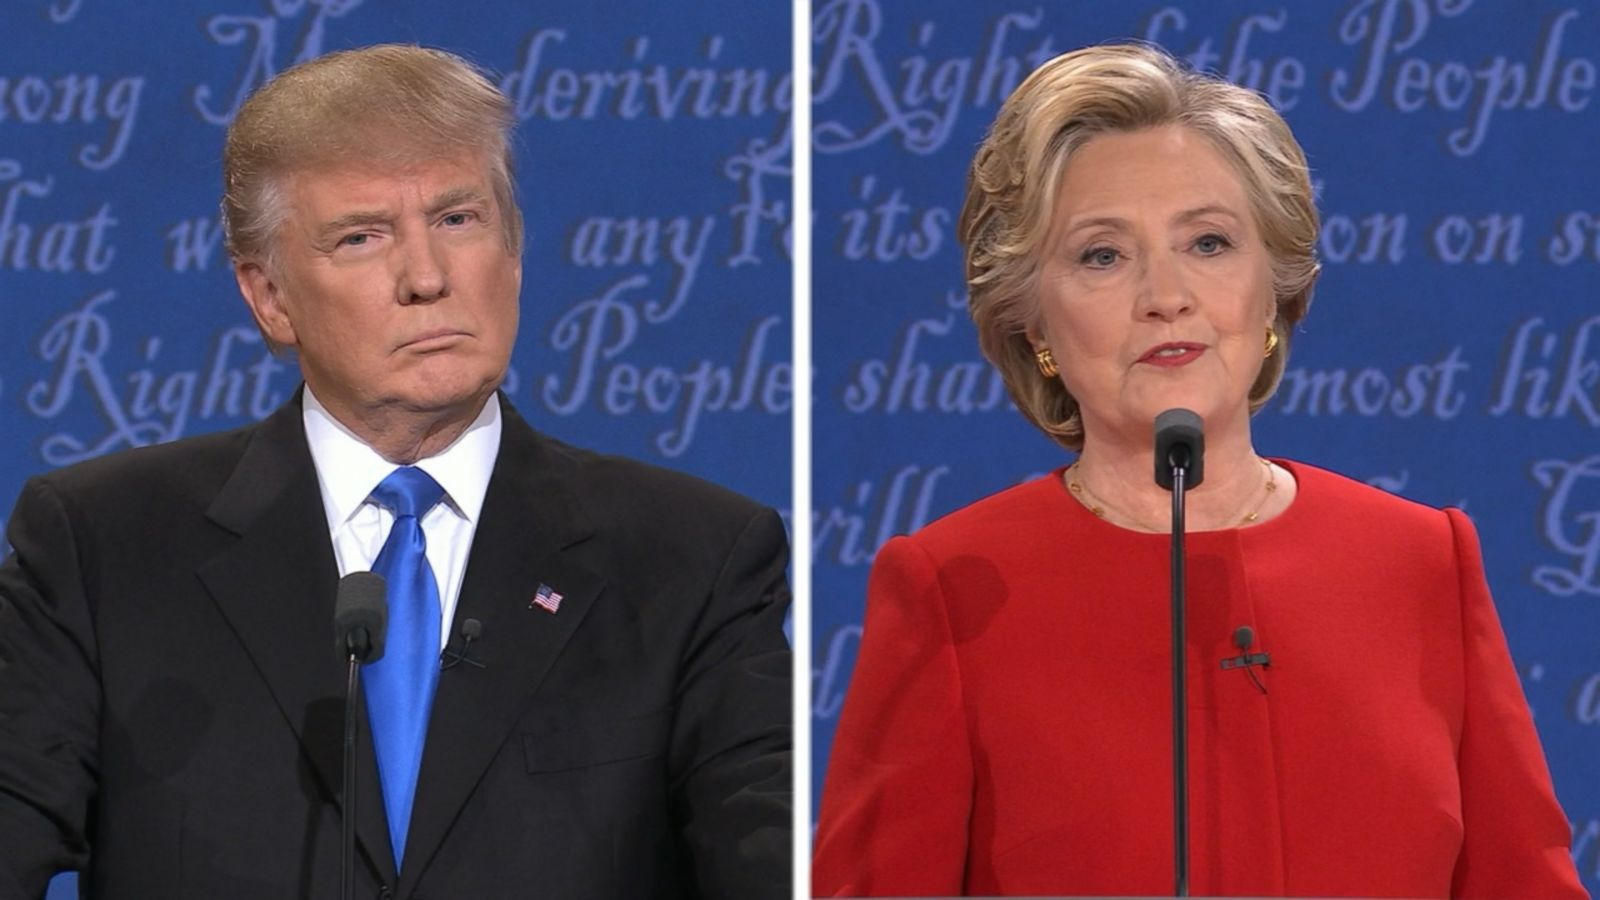 VIDEO: Hillary Clinton and Donald Trump debated at Hofstra University in Hempstead, New York.